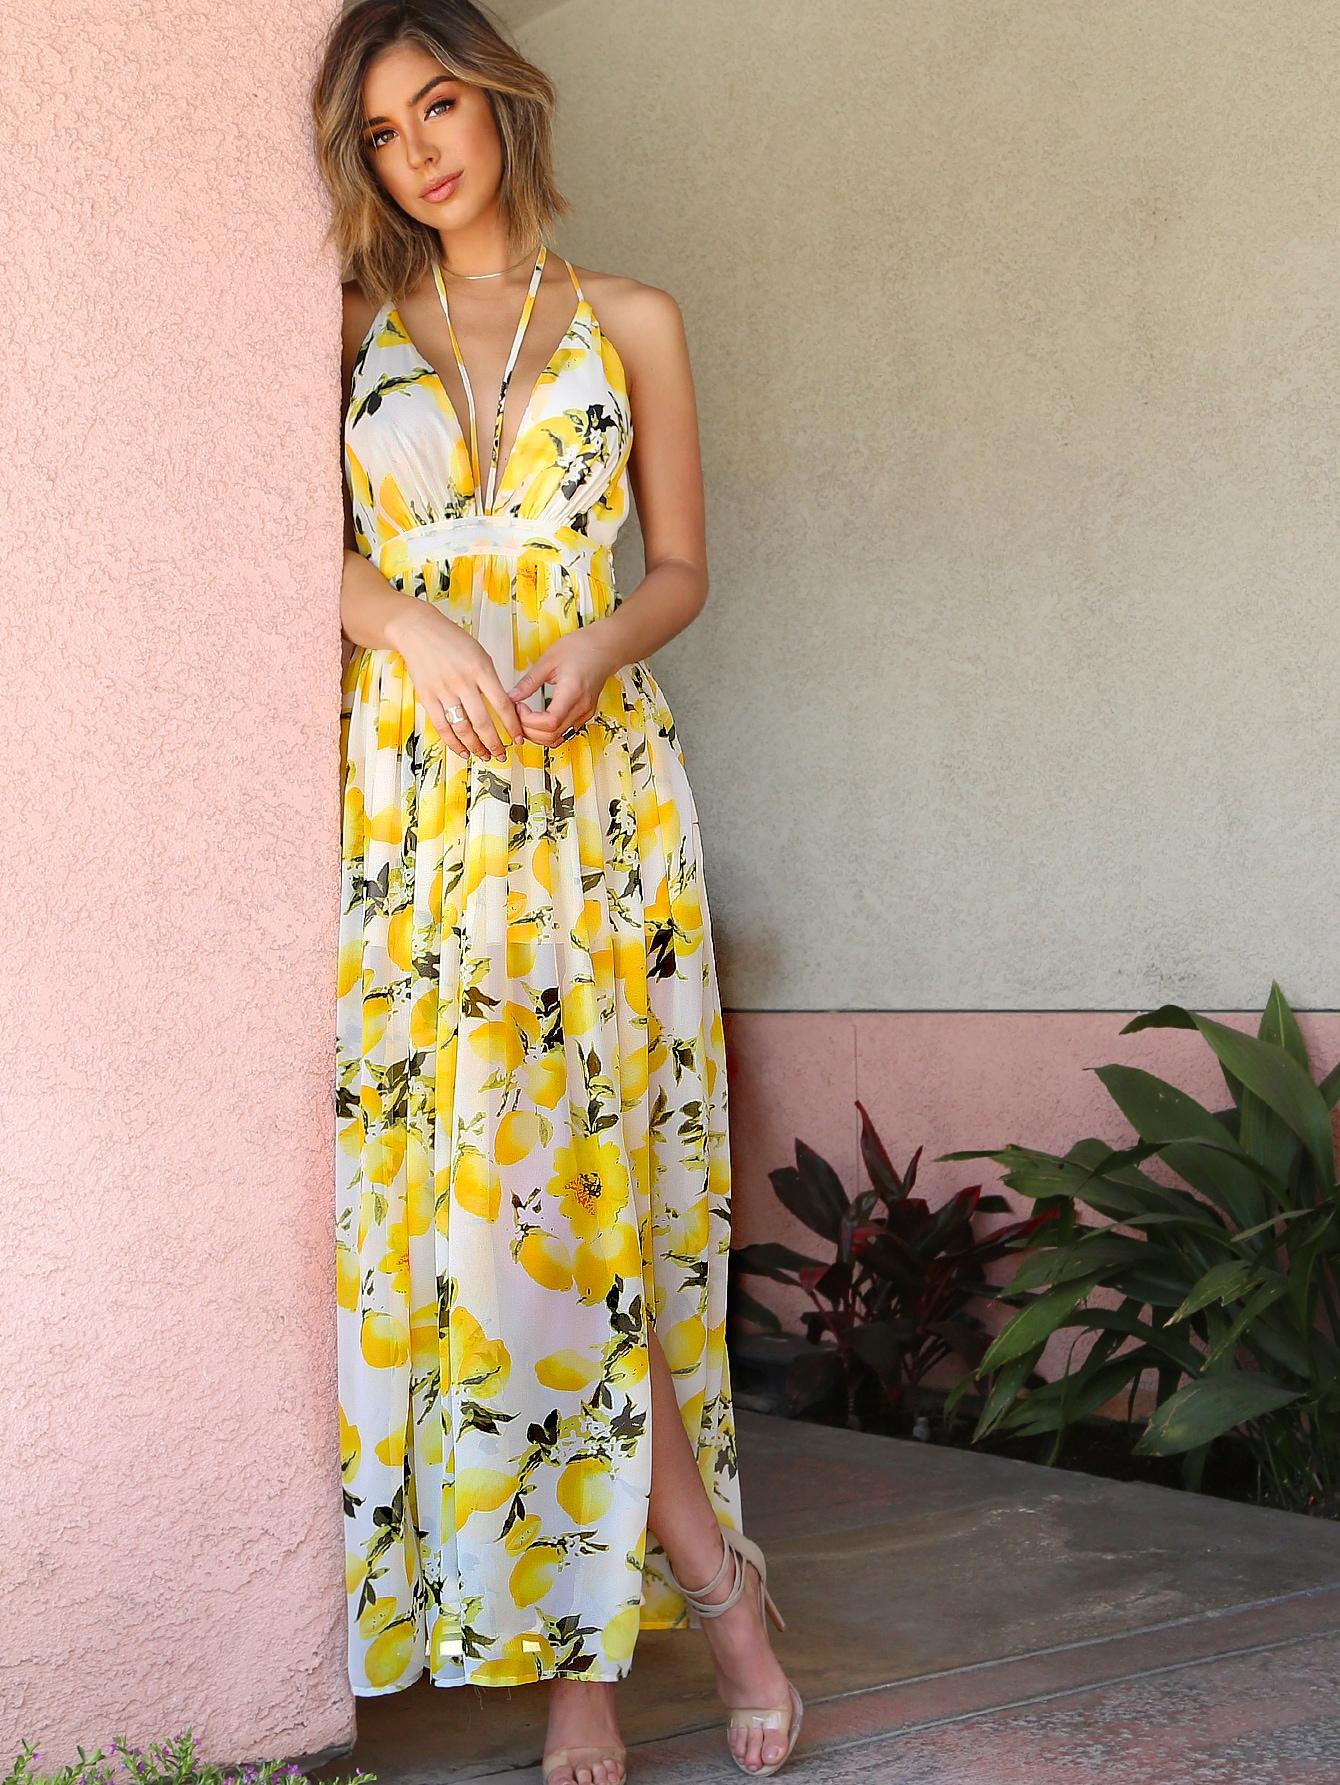 Lemon Print Chiffon Maxi Dress Ivory Shein Sheinside